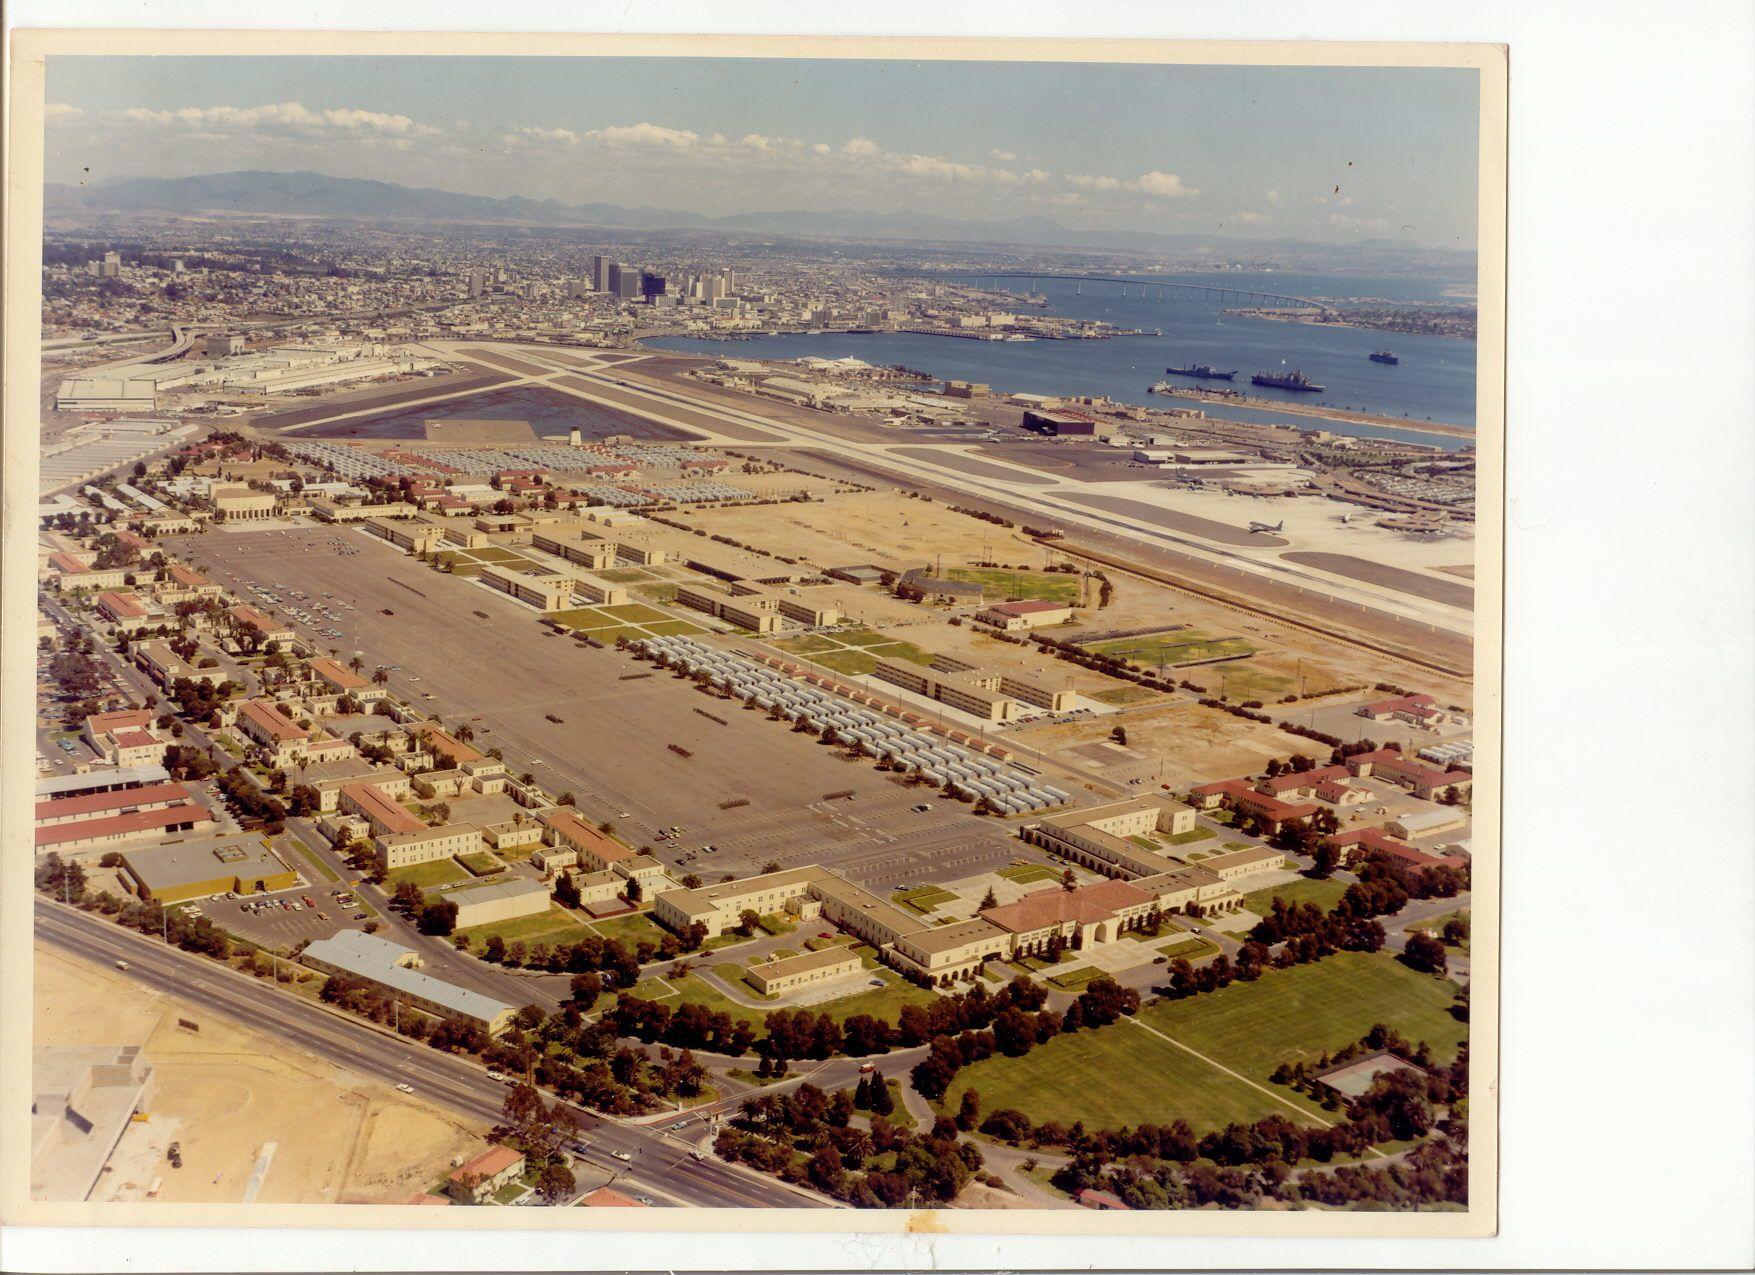 Aerial View of MCRD | Marines | Pinterest | Marine corps ...